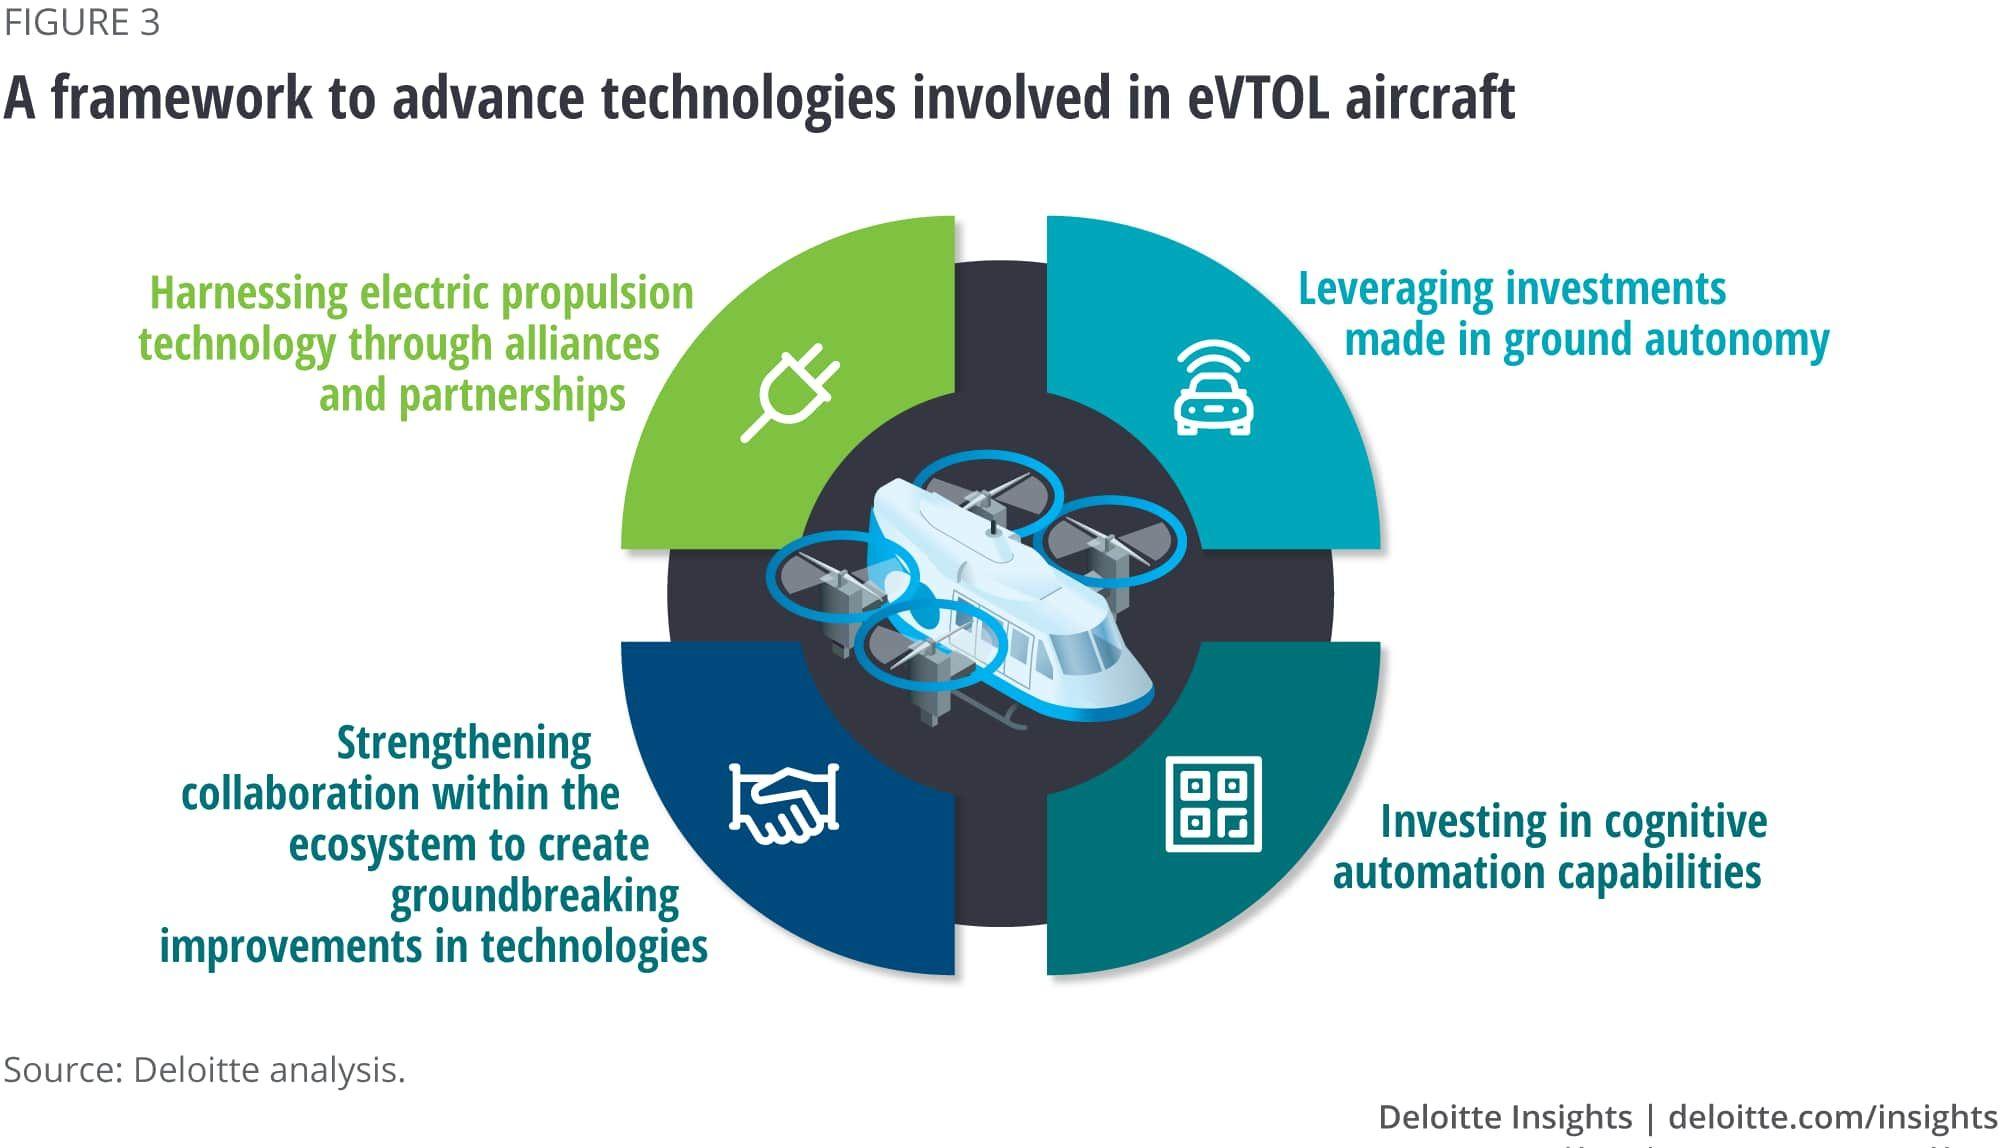 A framework to advance technologies involved in eVTOL